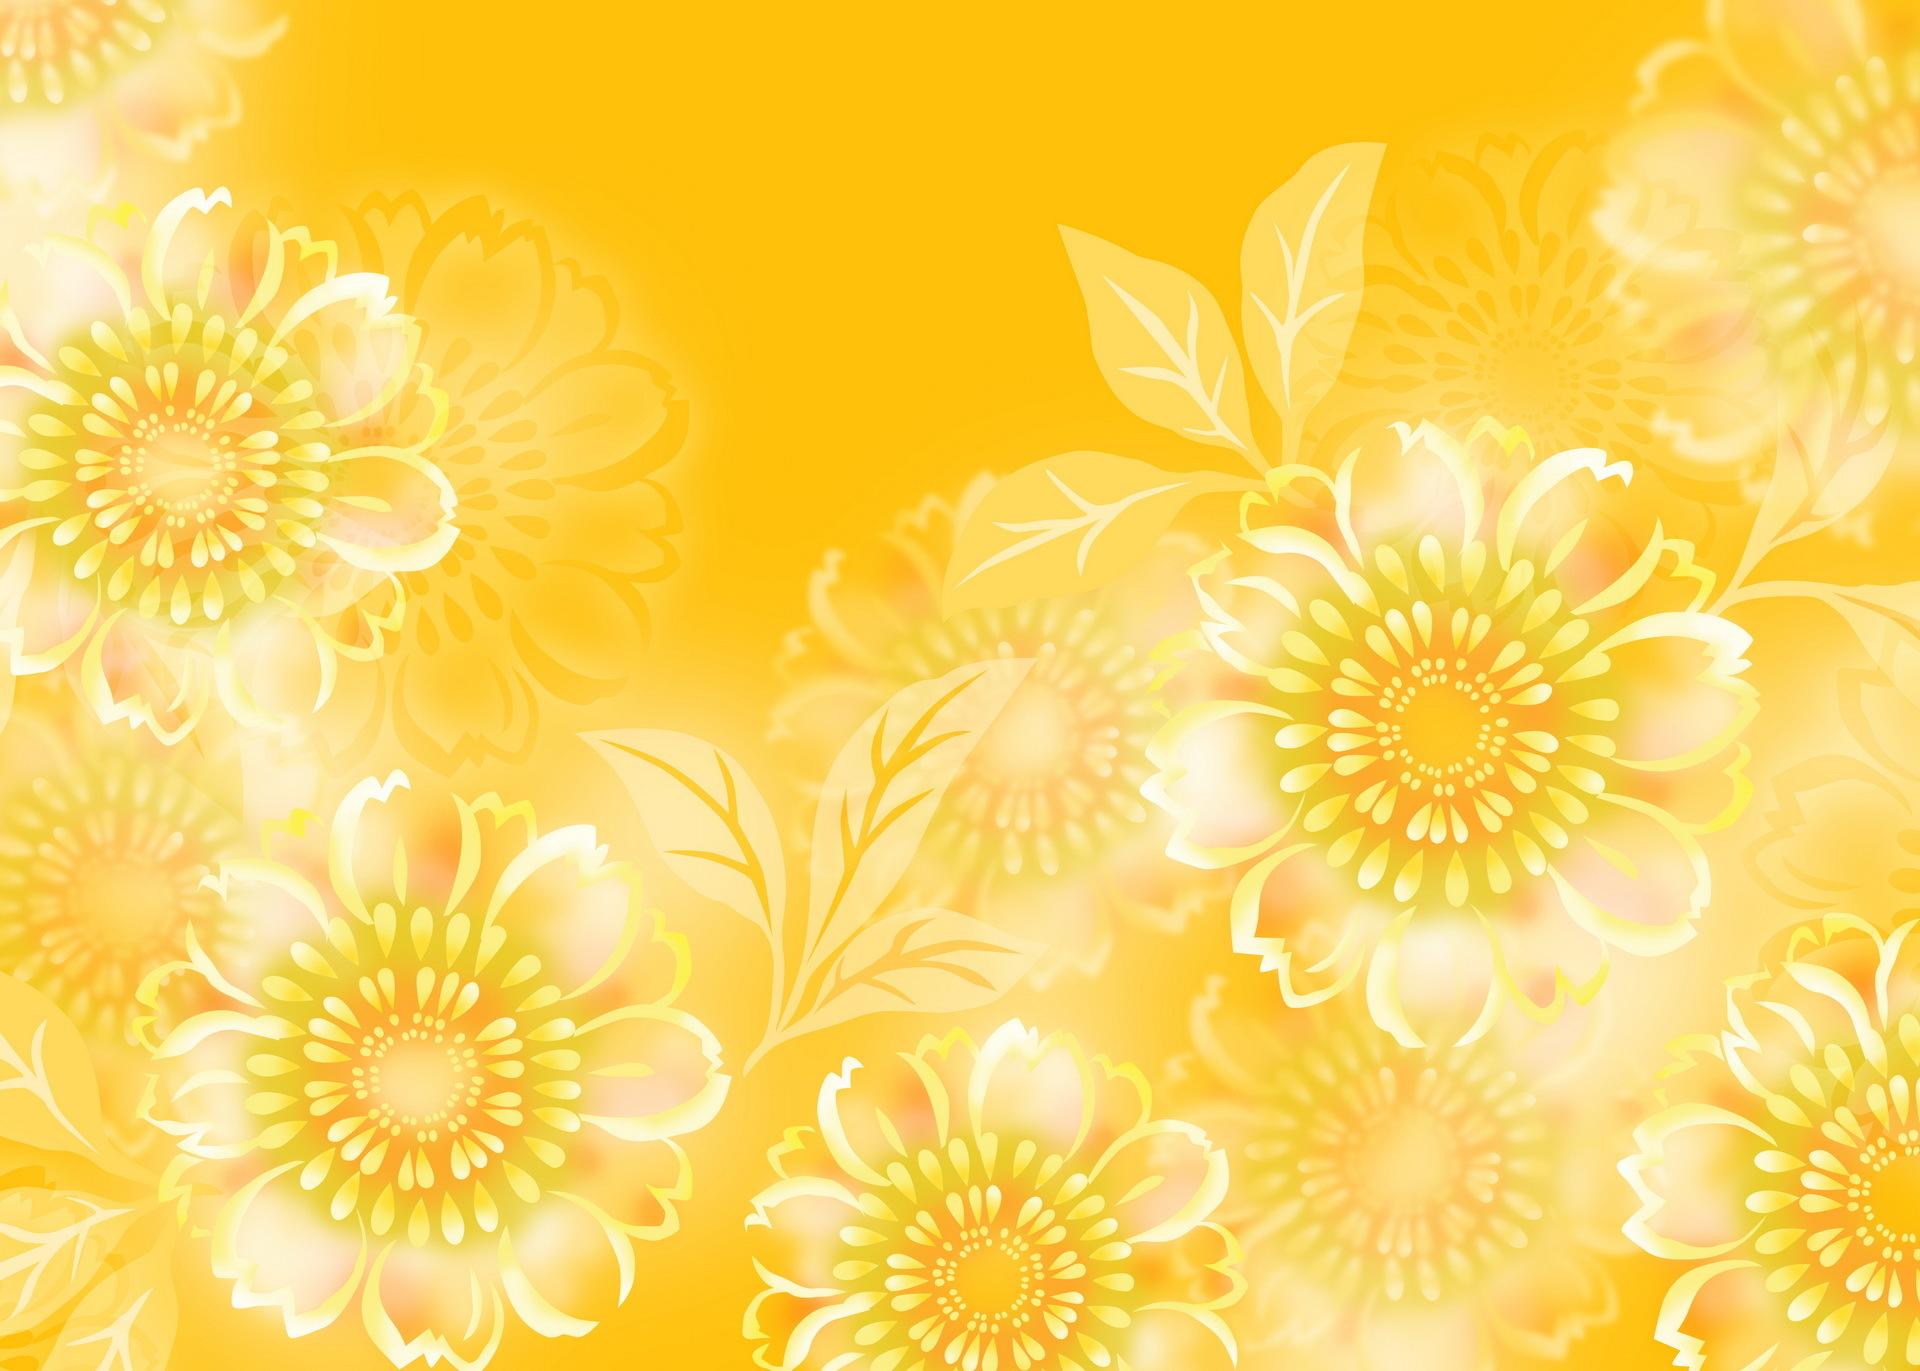 Flower Hd Wallpaper Background Image 1920x1371 Id